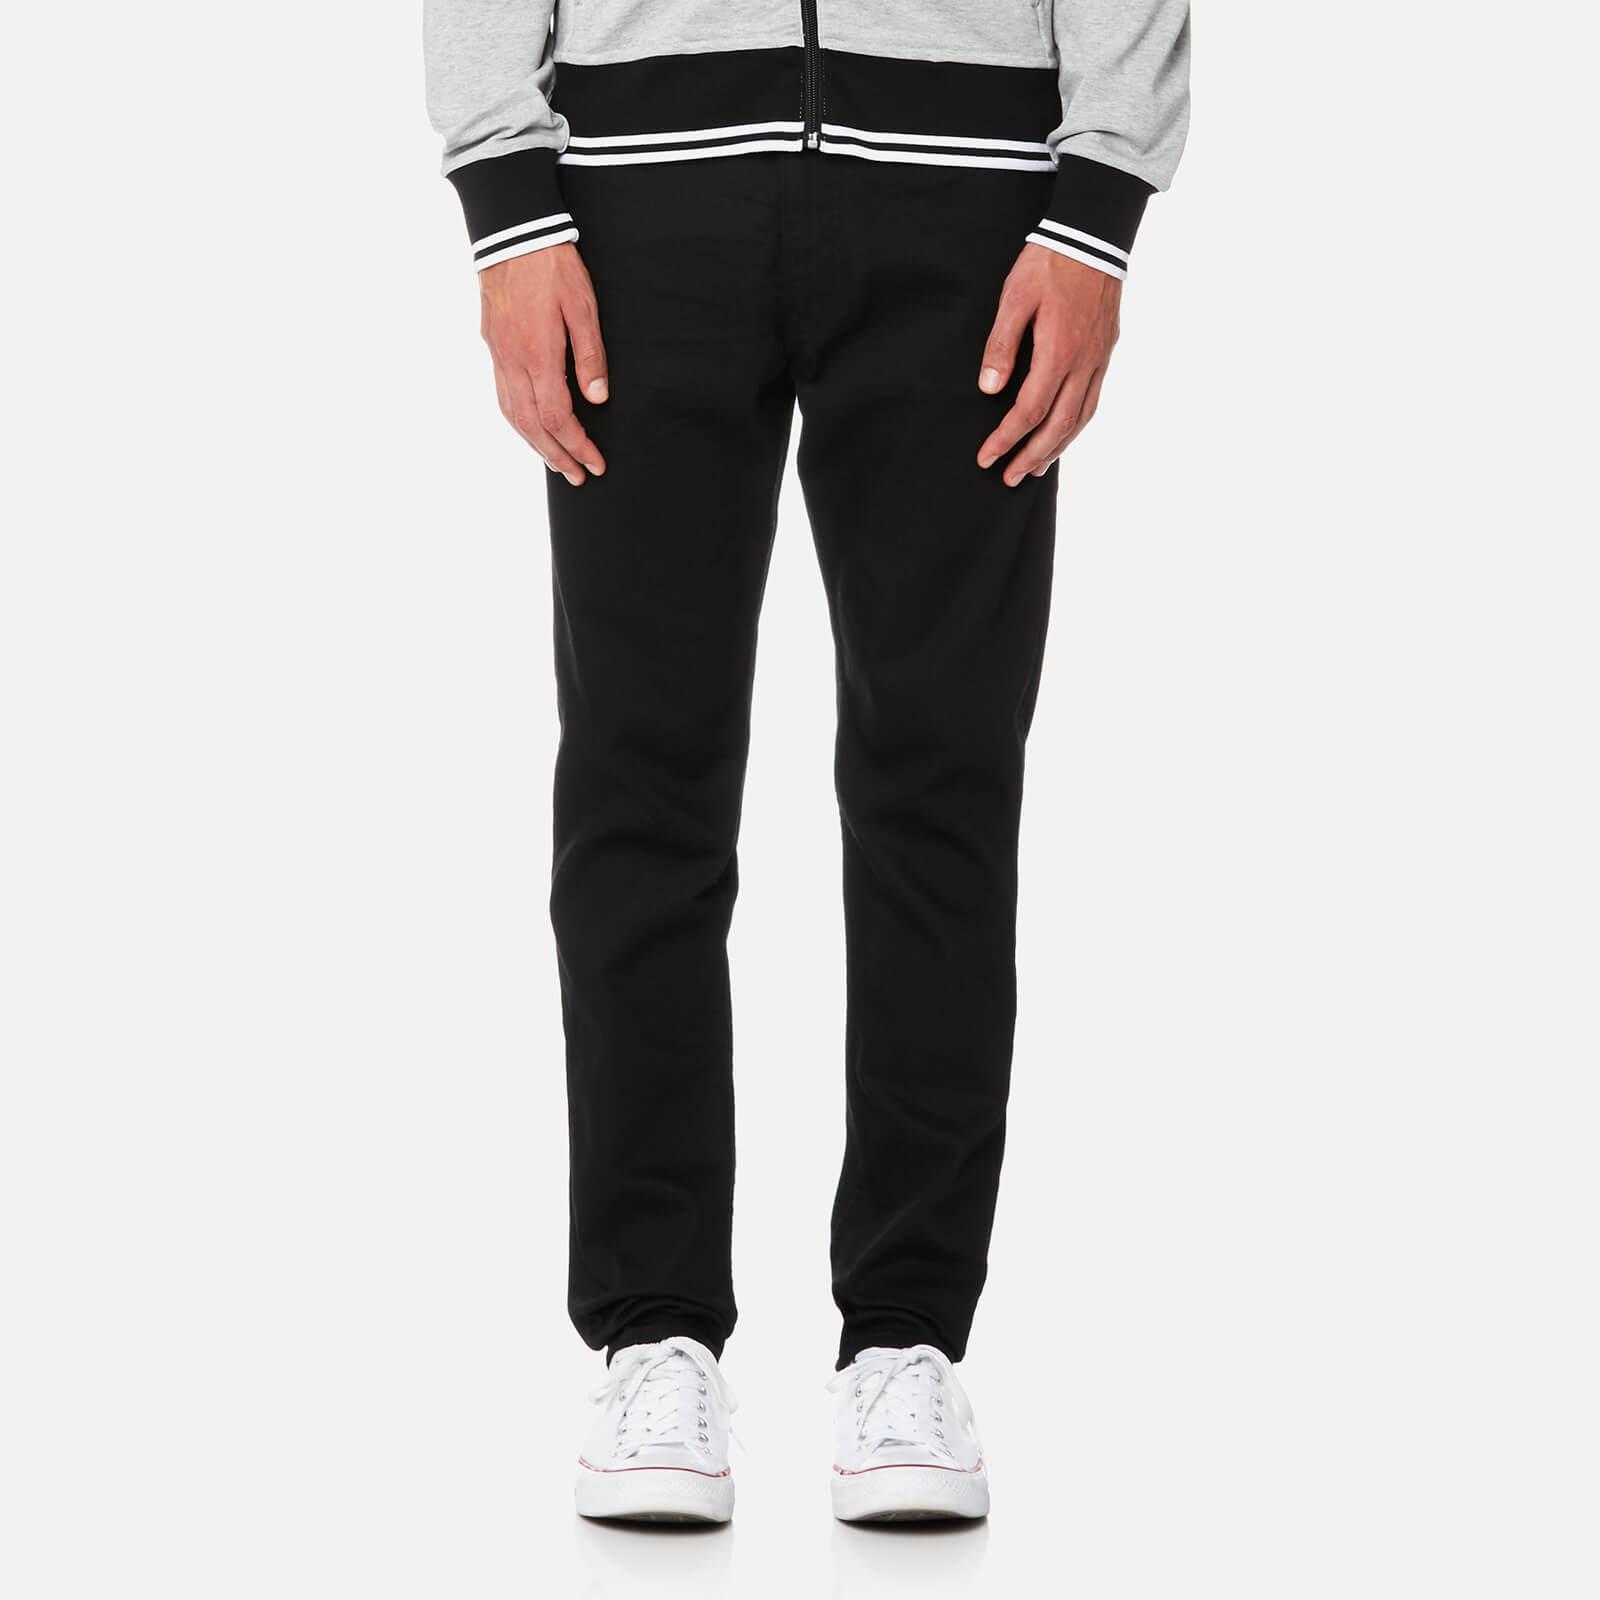 73d2aa0b0d7d Polo Ralph Lauren Men s Sullivan Stretch Jeans - Edwards Black - Free UK  Delivery over £50